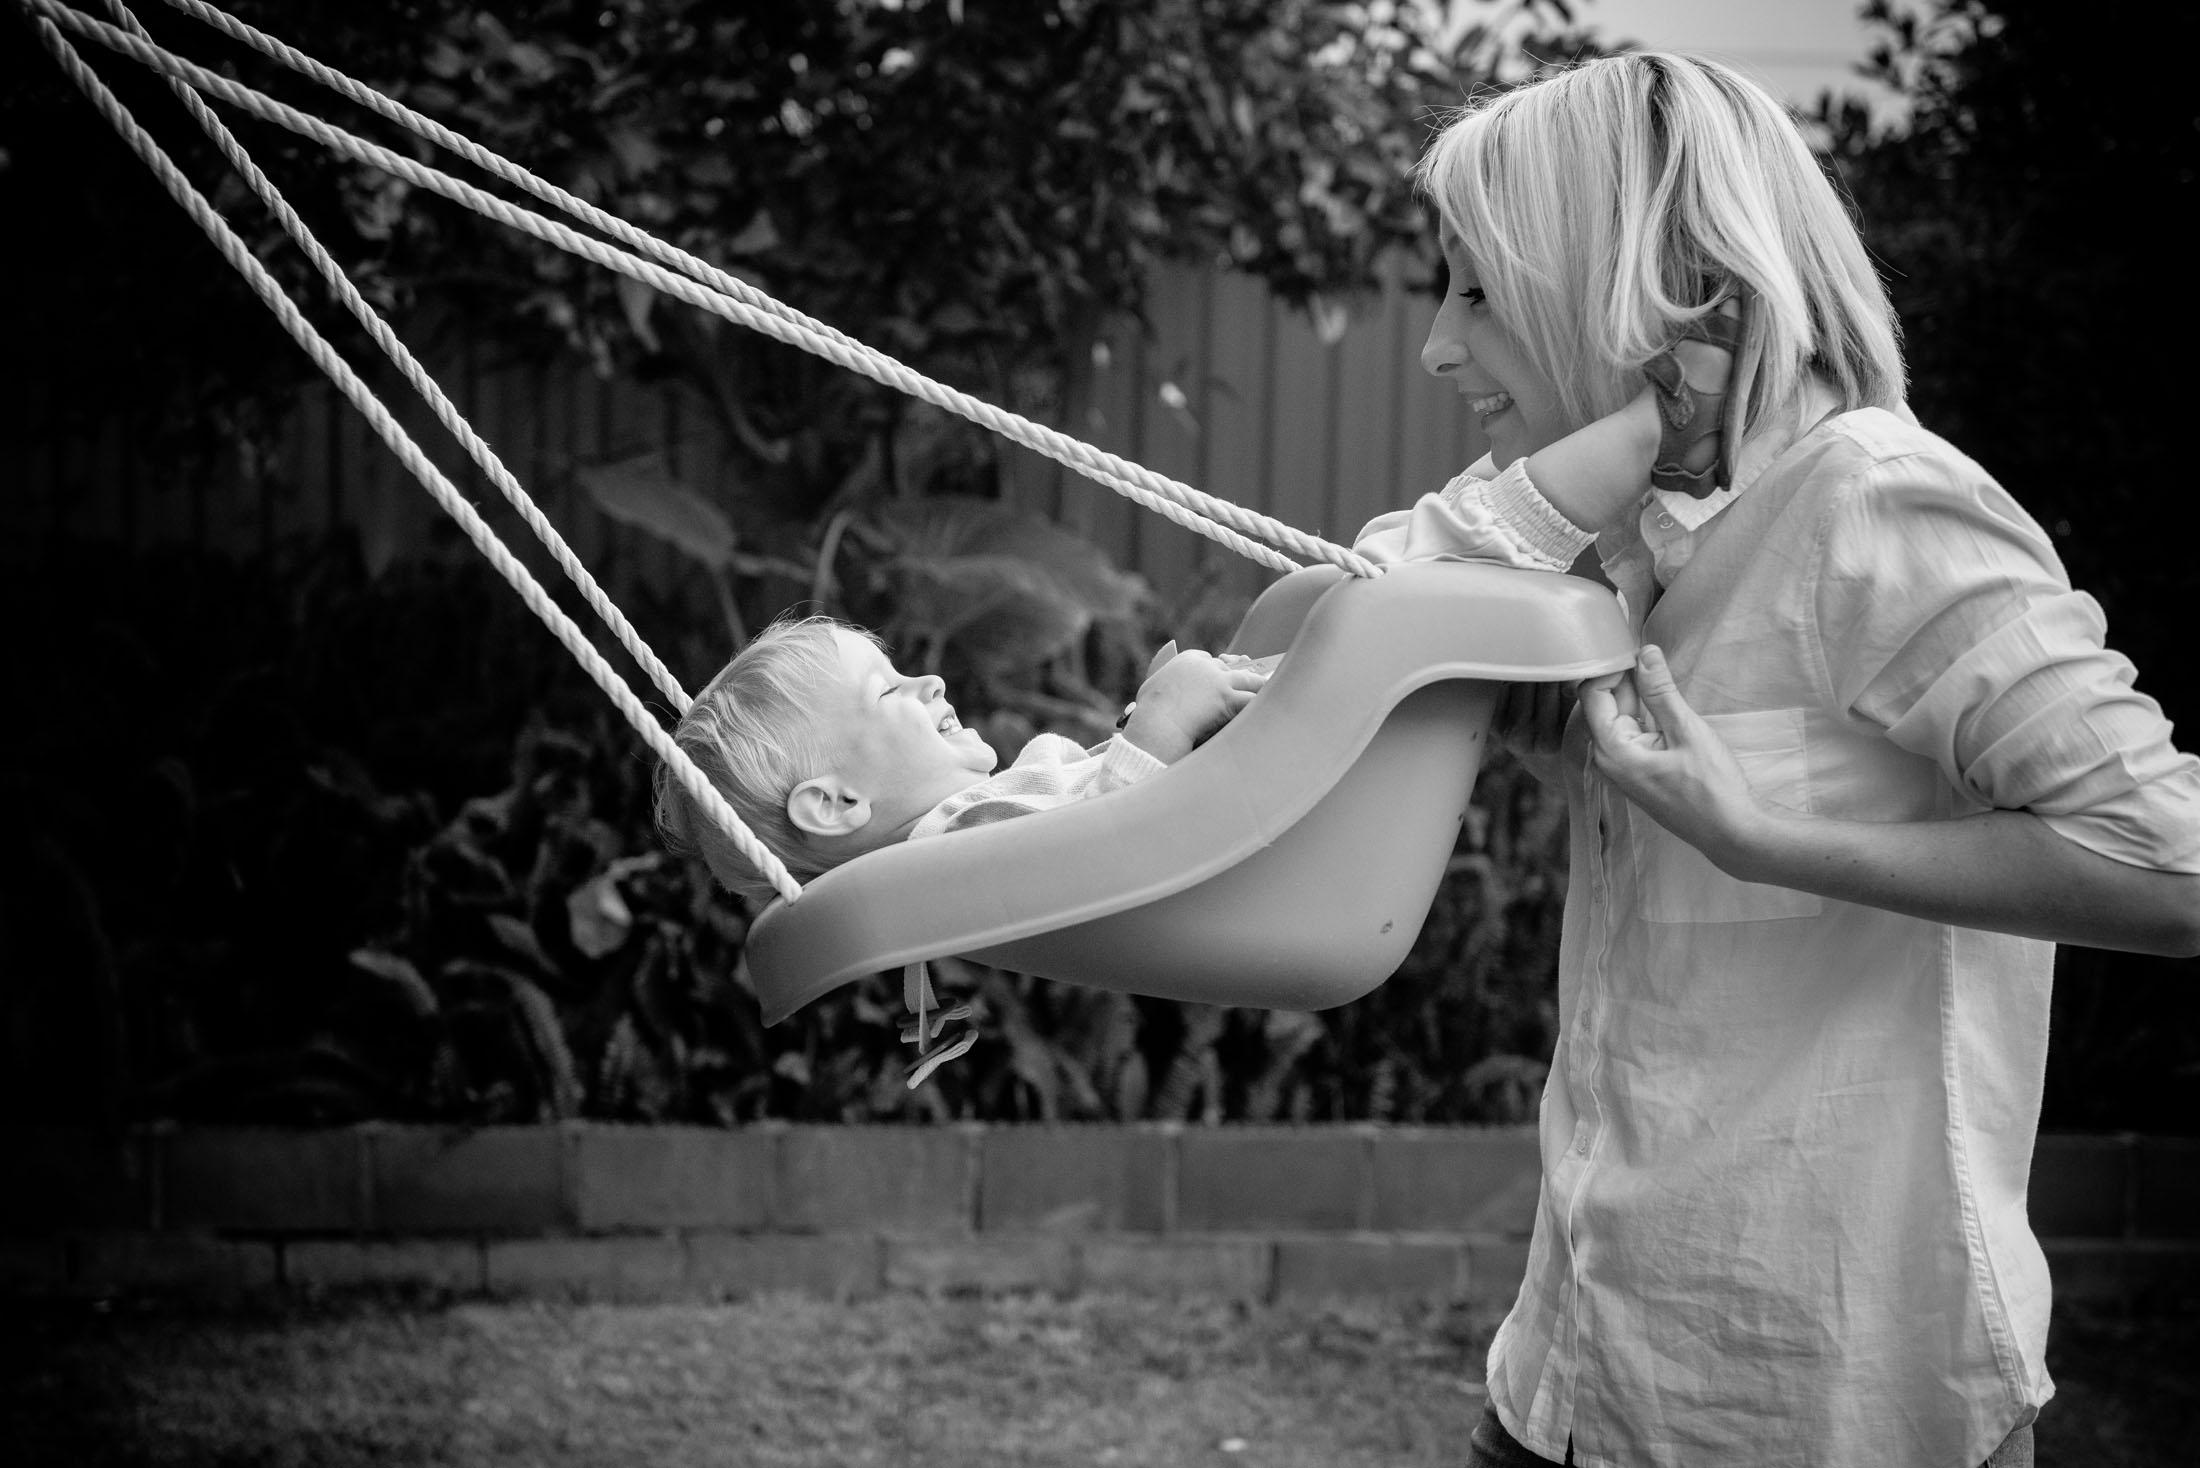 Laing_Family-Photography-unposed02.JPG